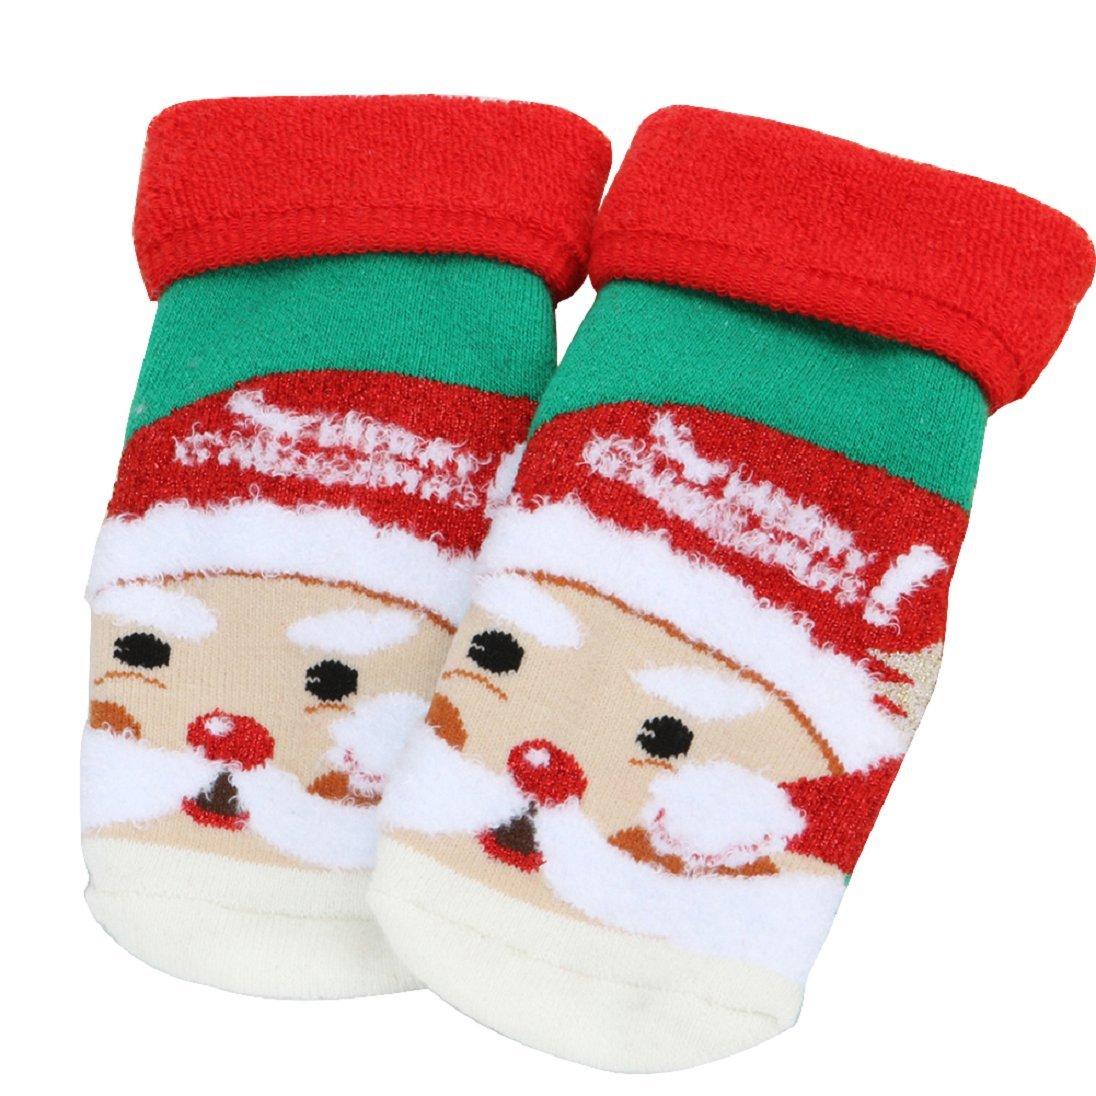 San Bodhi® Baby Toddler Cute Christmas Winter Warm Thick Floor Socks